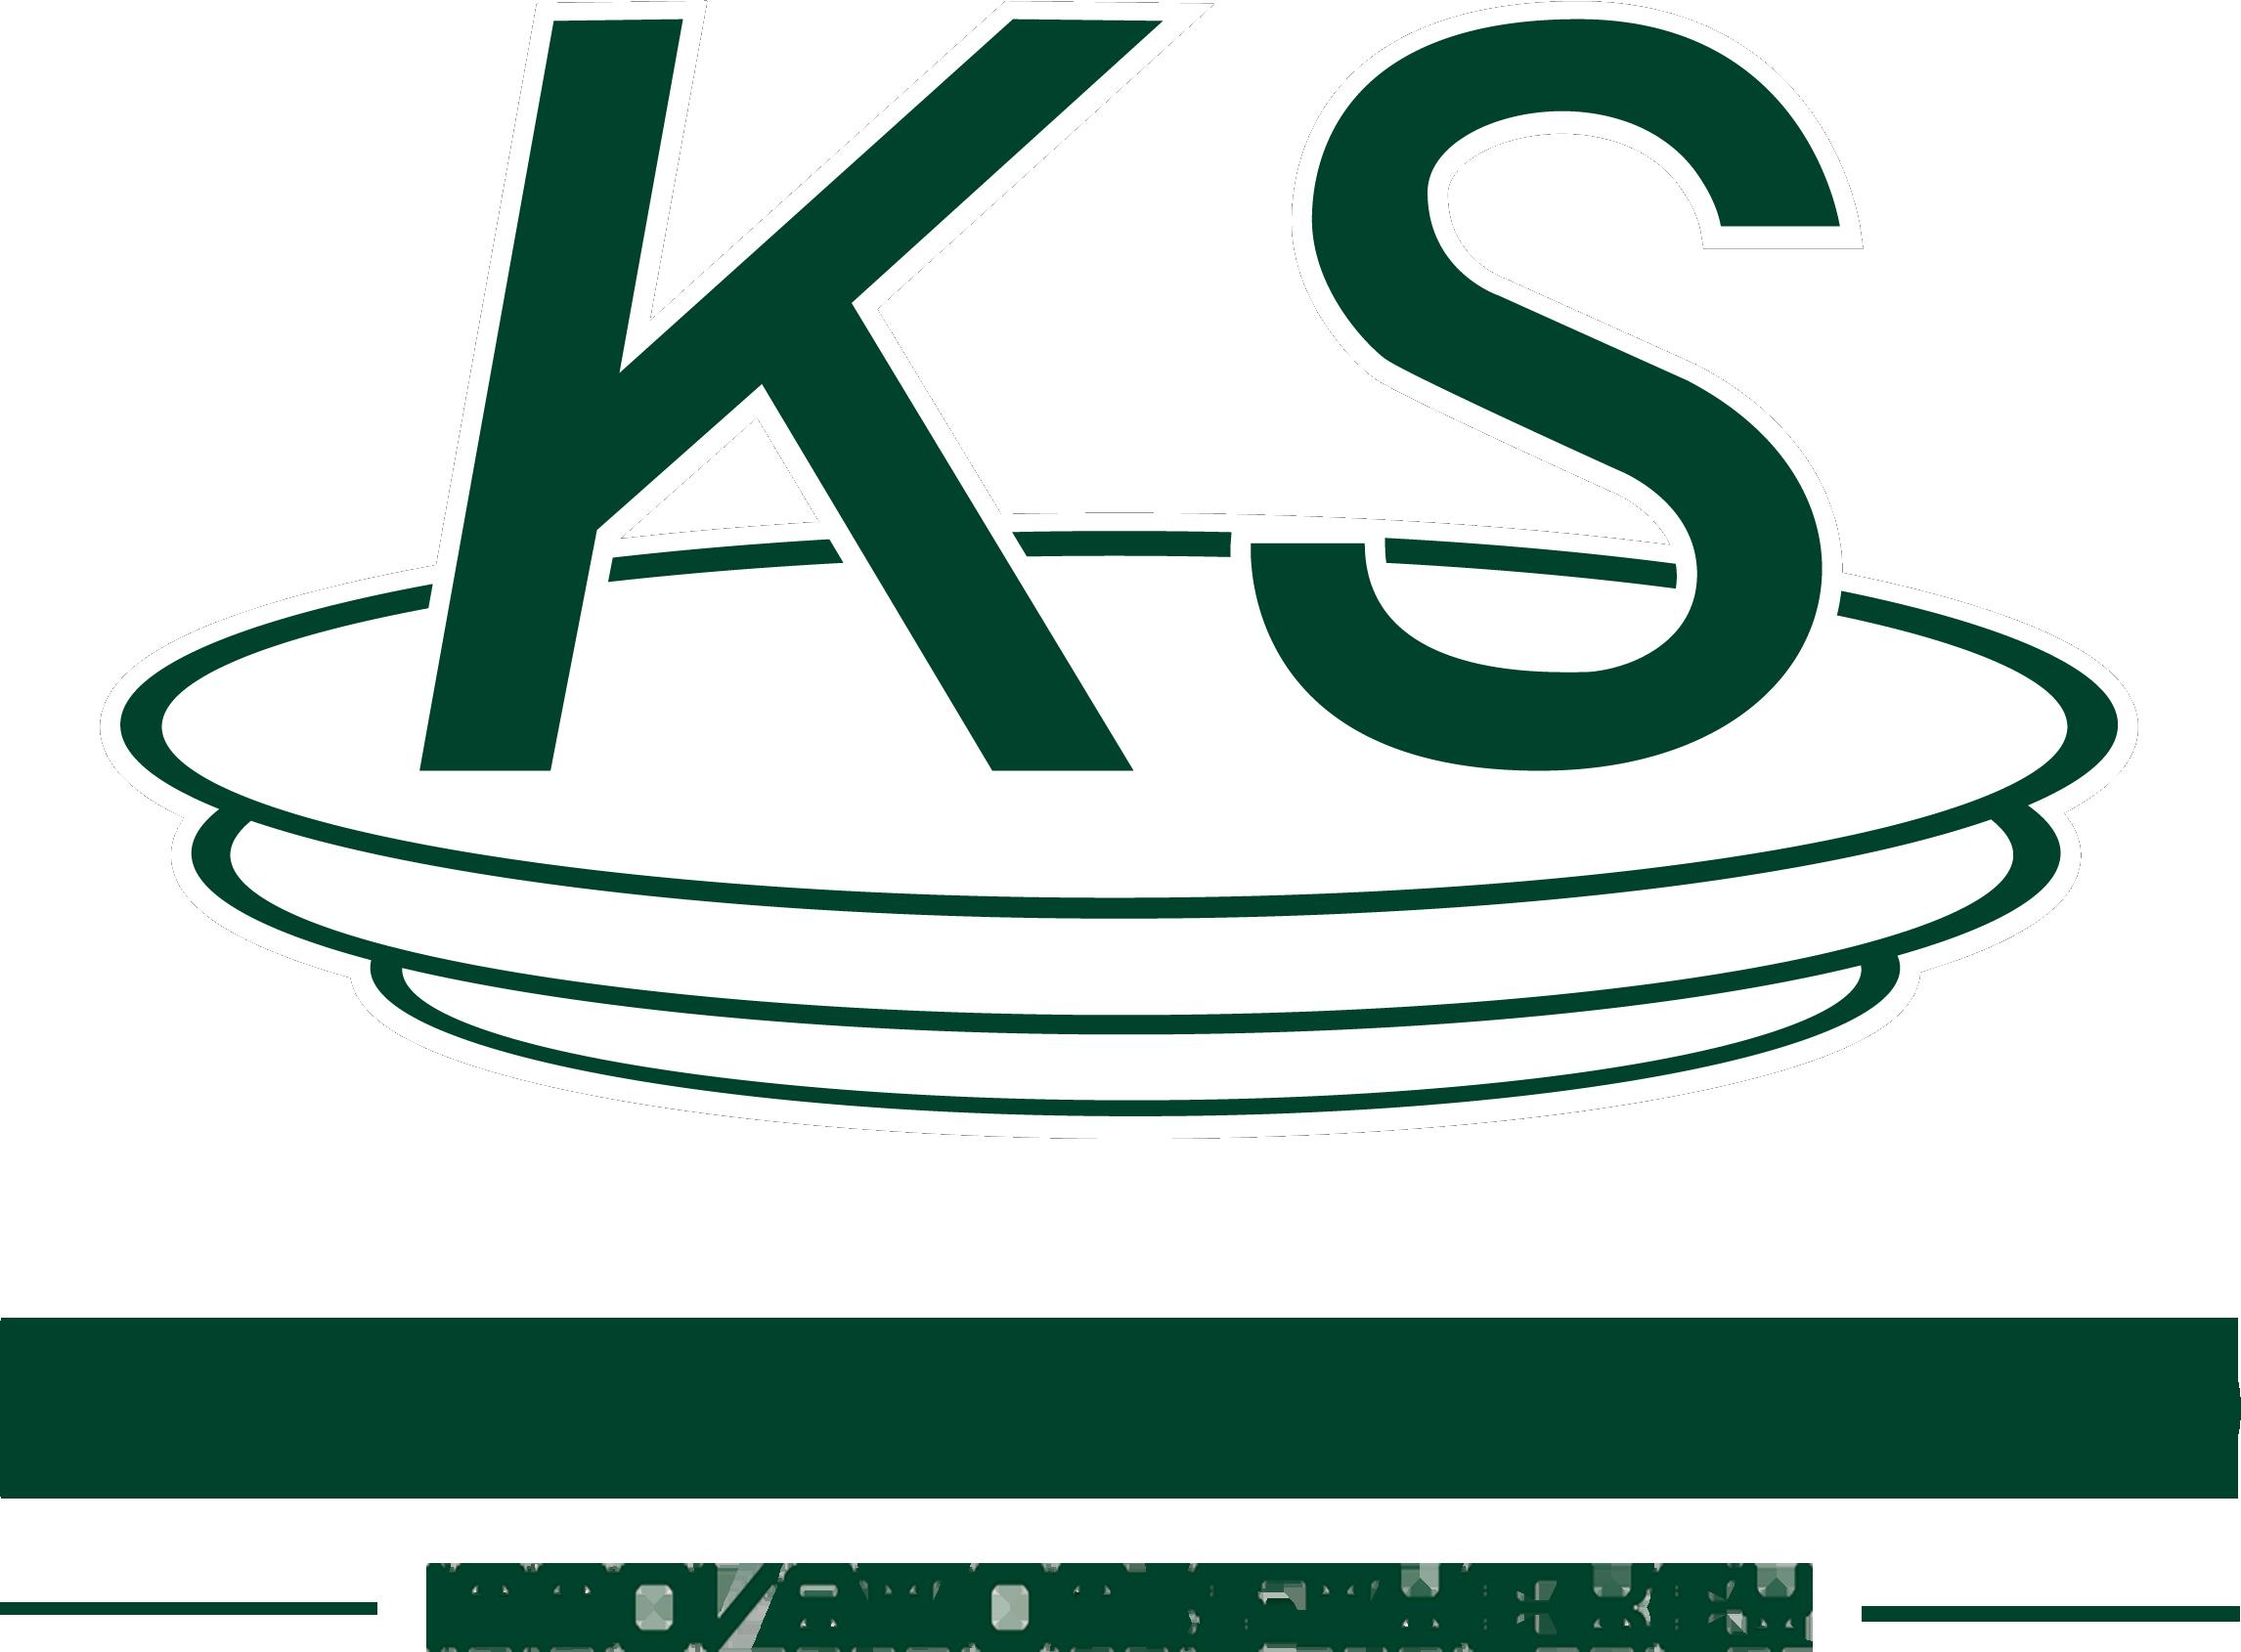 Kueen Sing Auto (M) Sdn Bhd